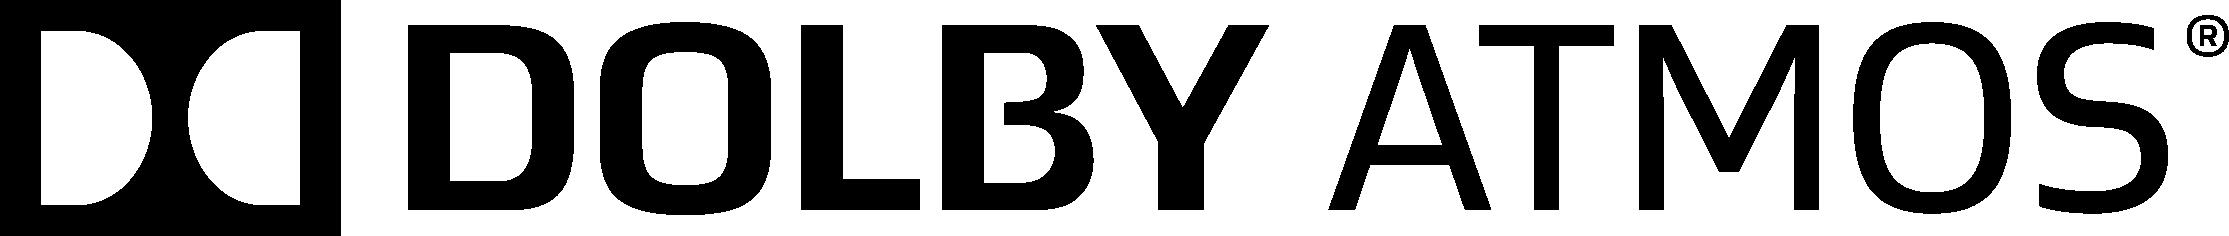 DolbyAtmos_horizontal_black.png